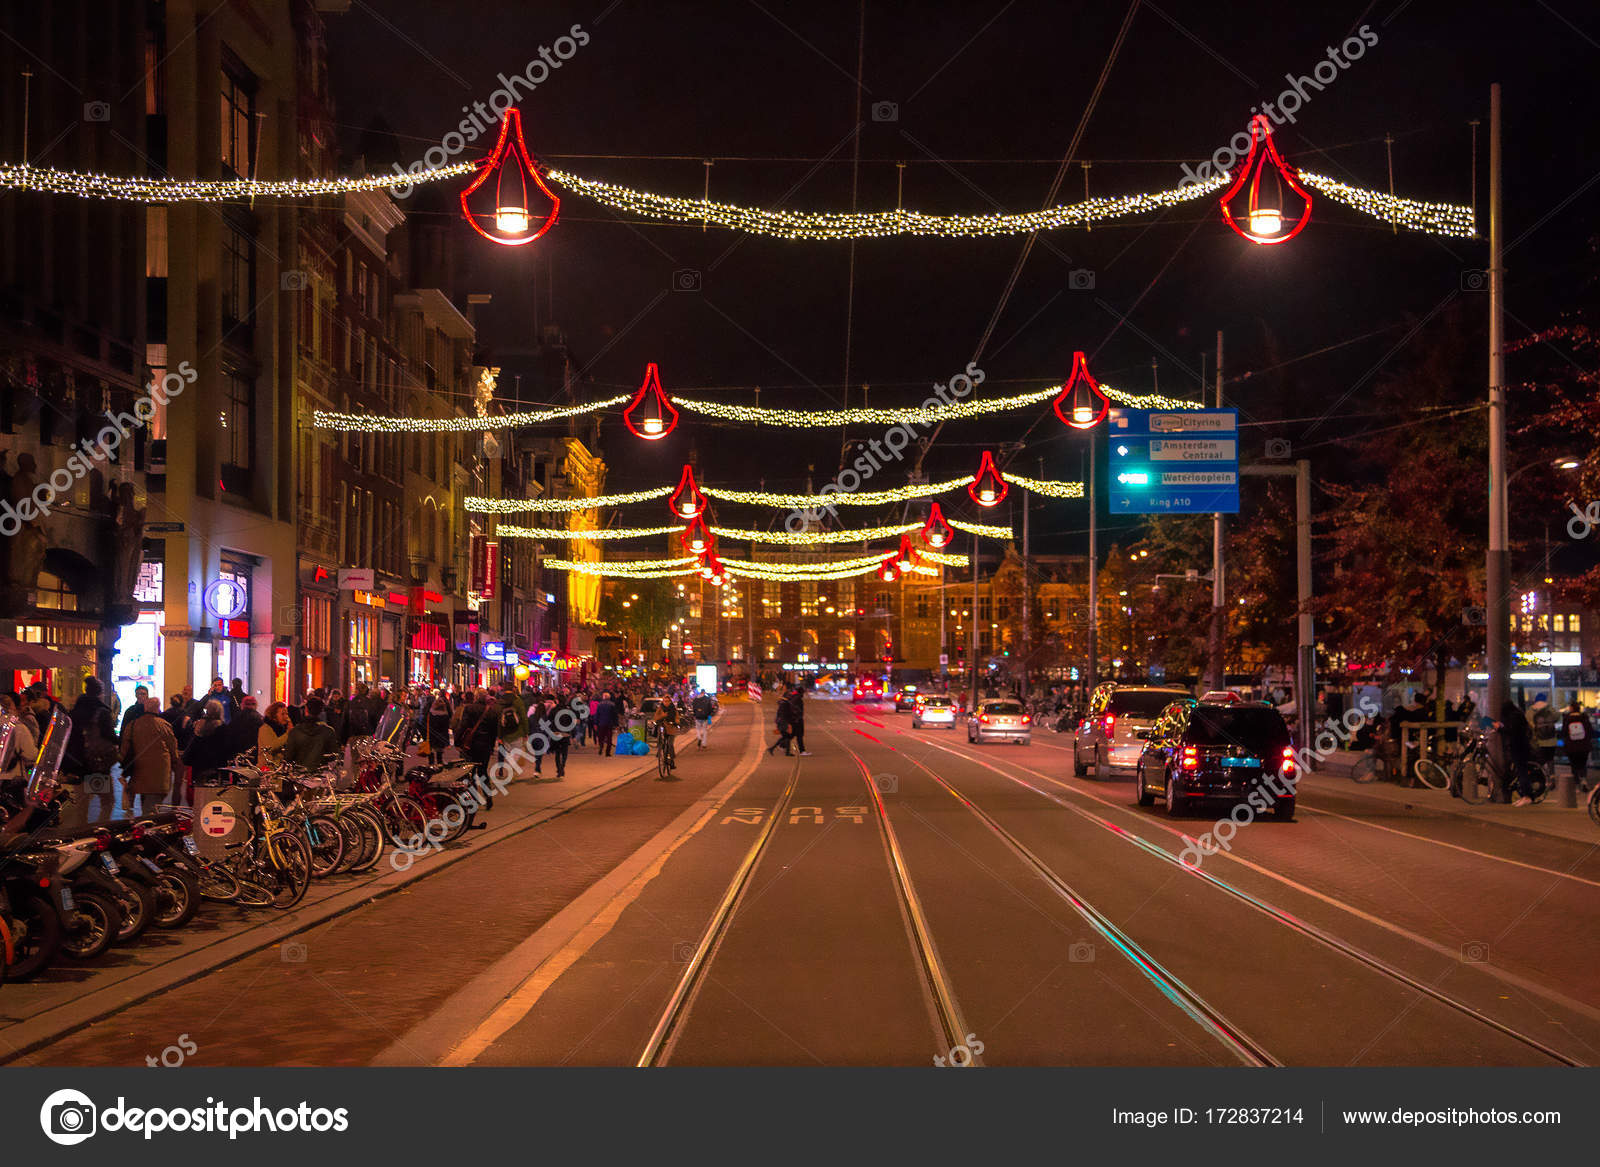 https://st3.depositphotos.com/6105212/17283/i/1600/depositphotos_172837214-stockafbeelding-kerst-nacht-verlichting-amsterdam-oud.jpg